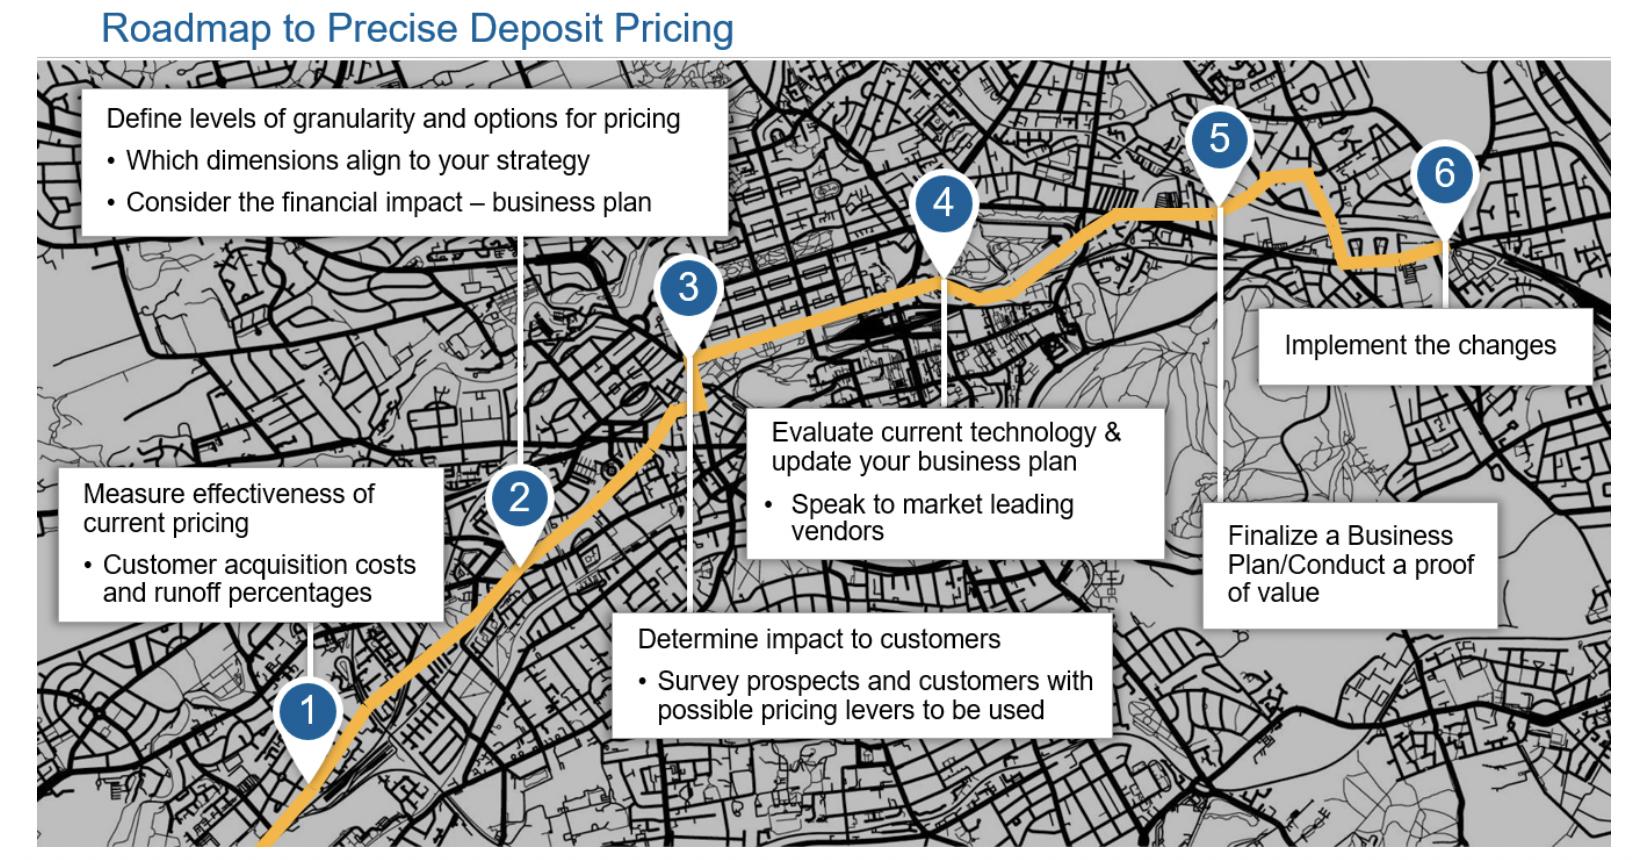 Roadmap to Precise Deposit Pricing